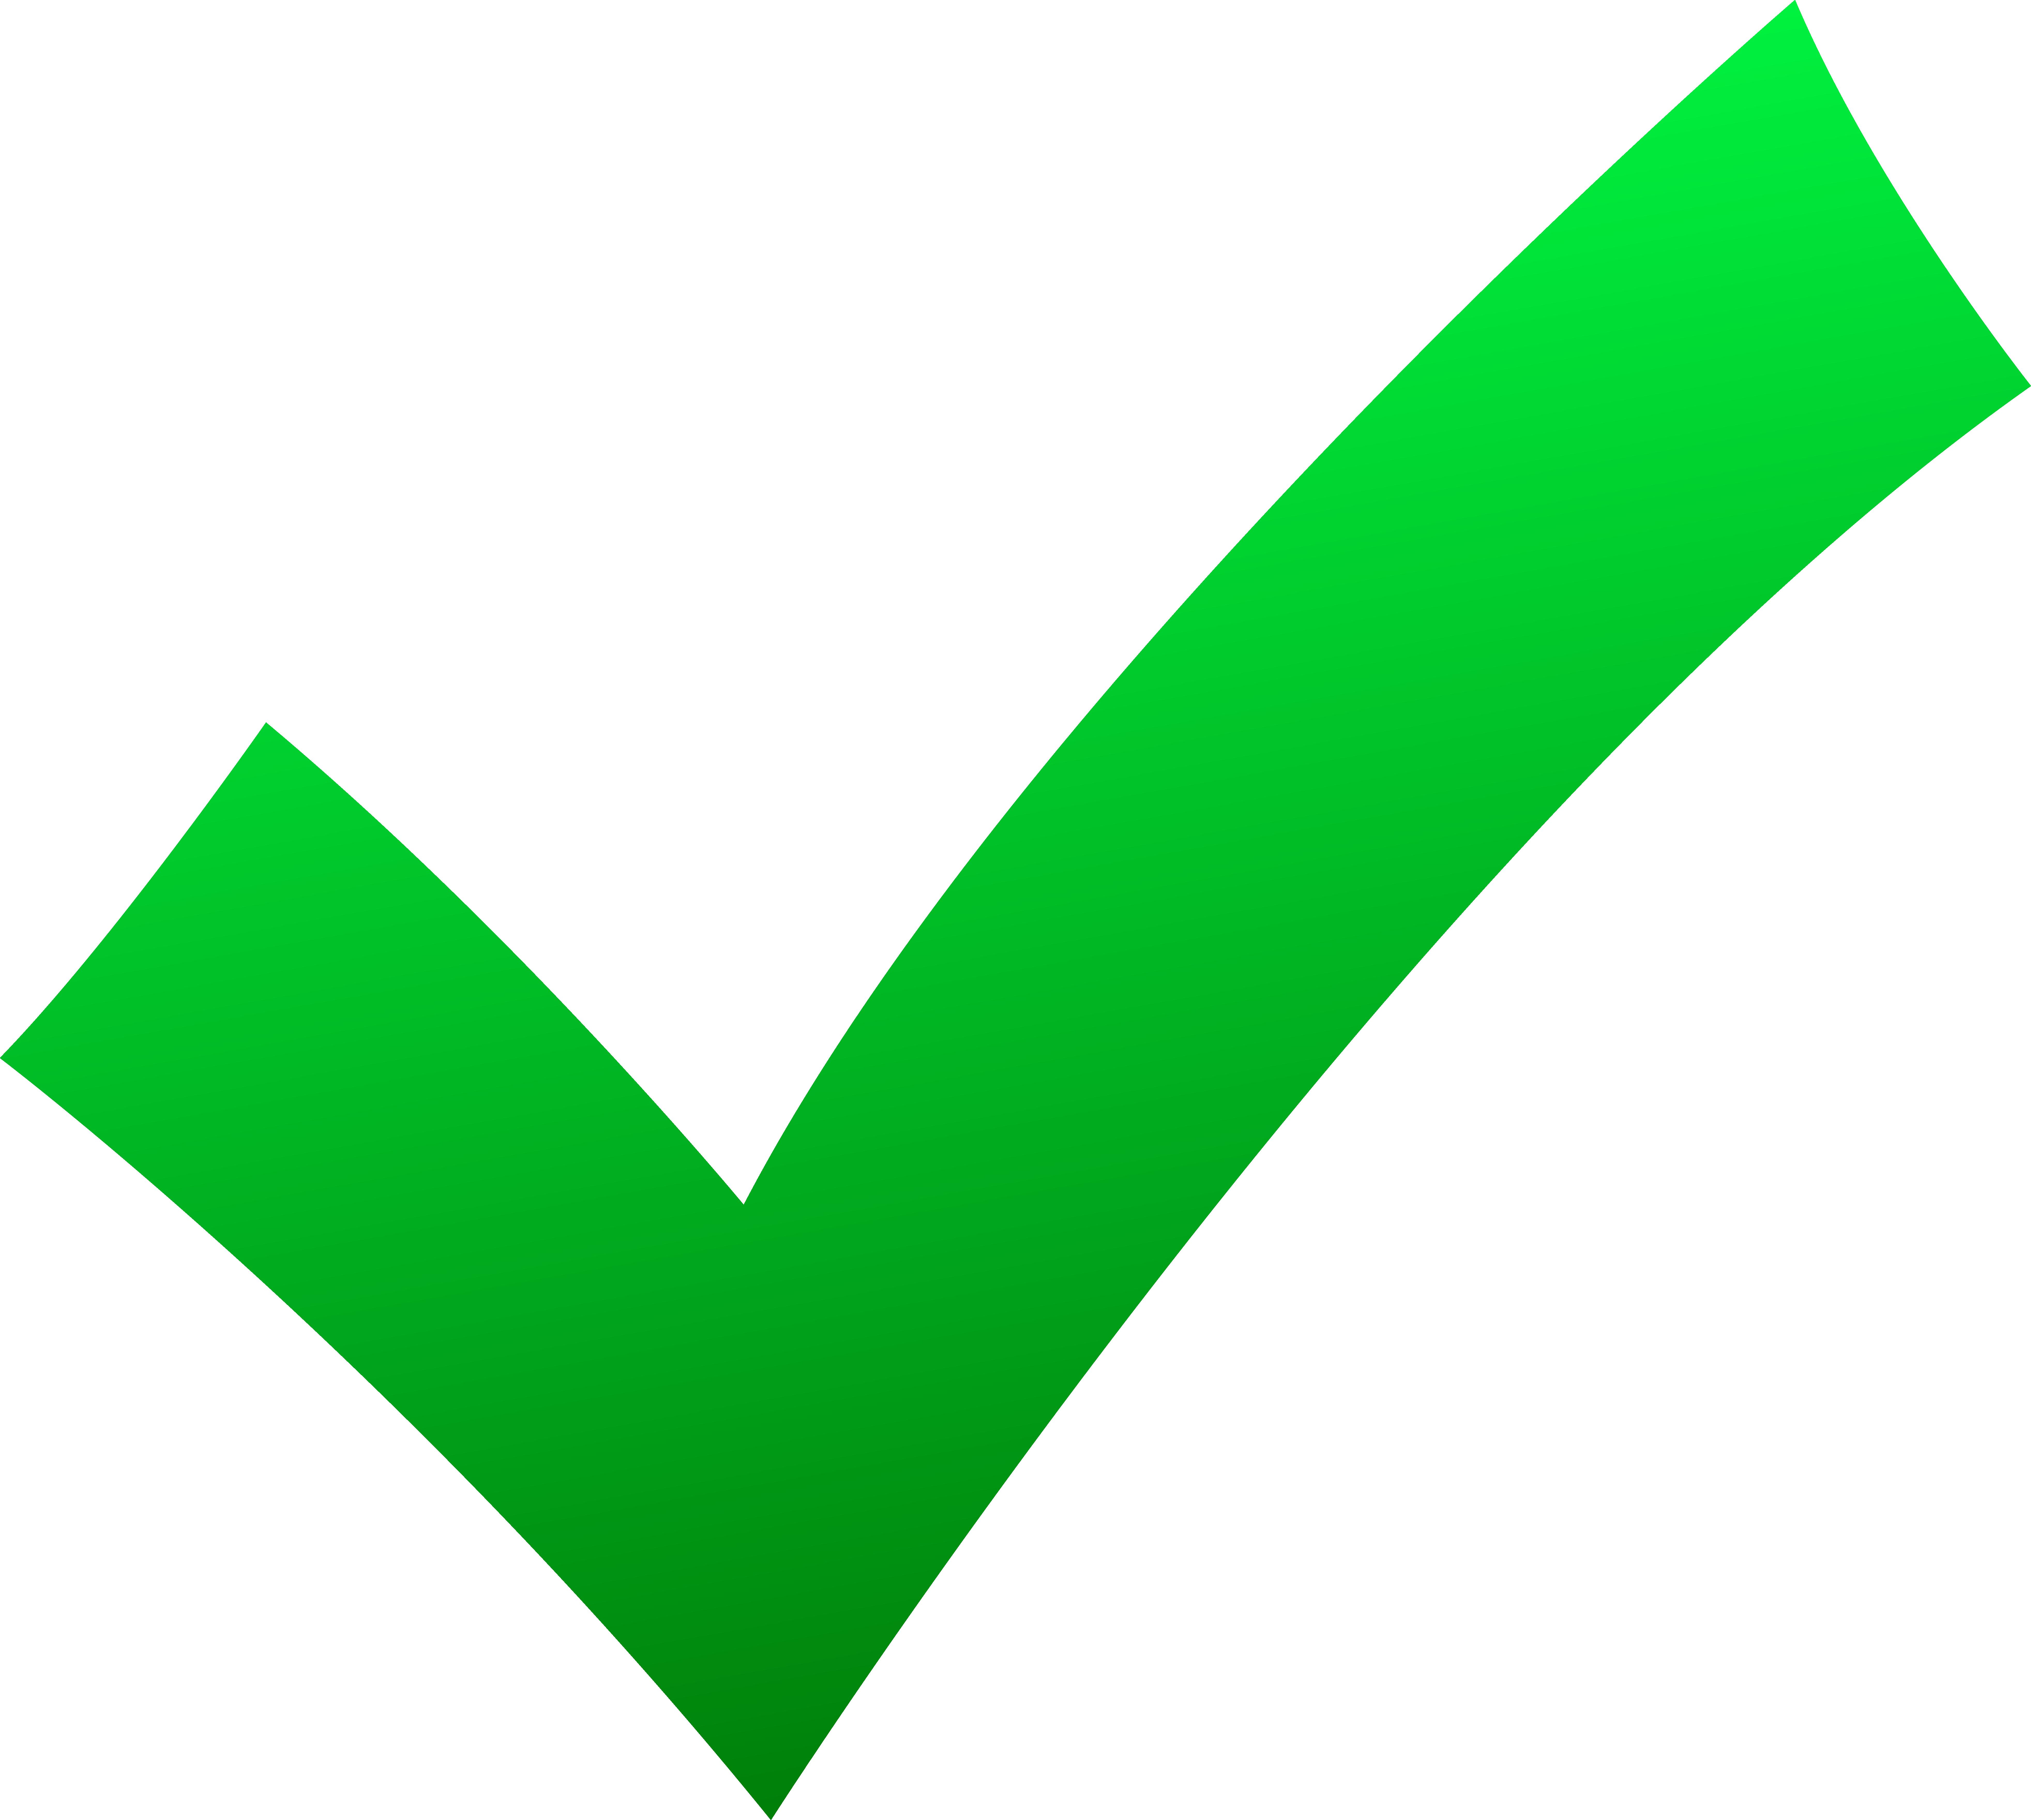 7855x7040 Green Tick Check Mark Tick Green Clipart